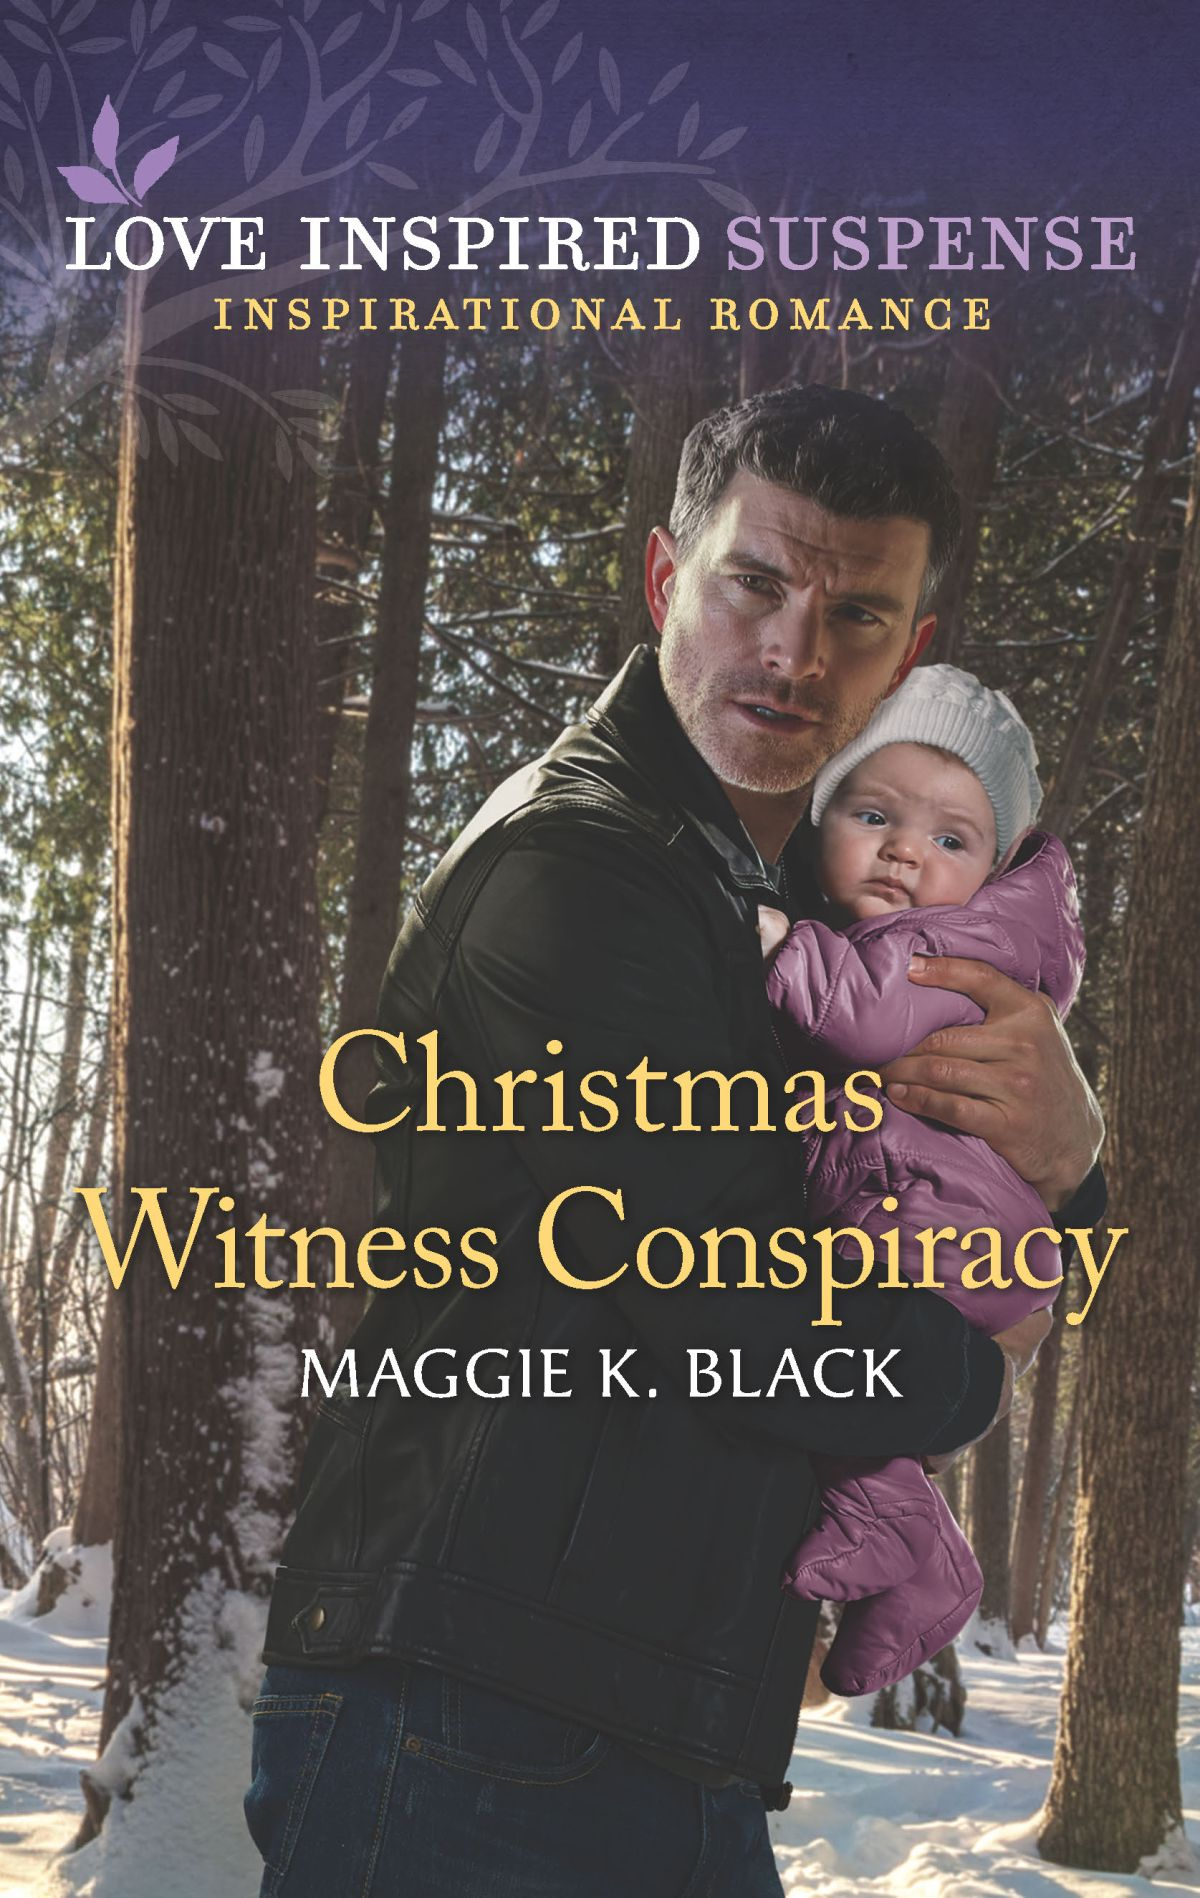 November 2020 Harlequin Suspense Blog Tour: Christmas Witness Conspiracy by Maggie KBlack